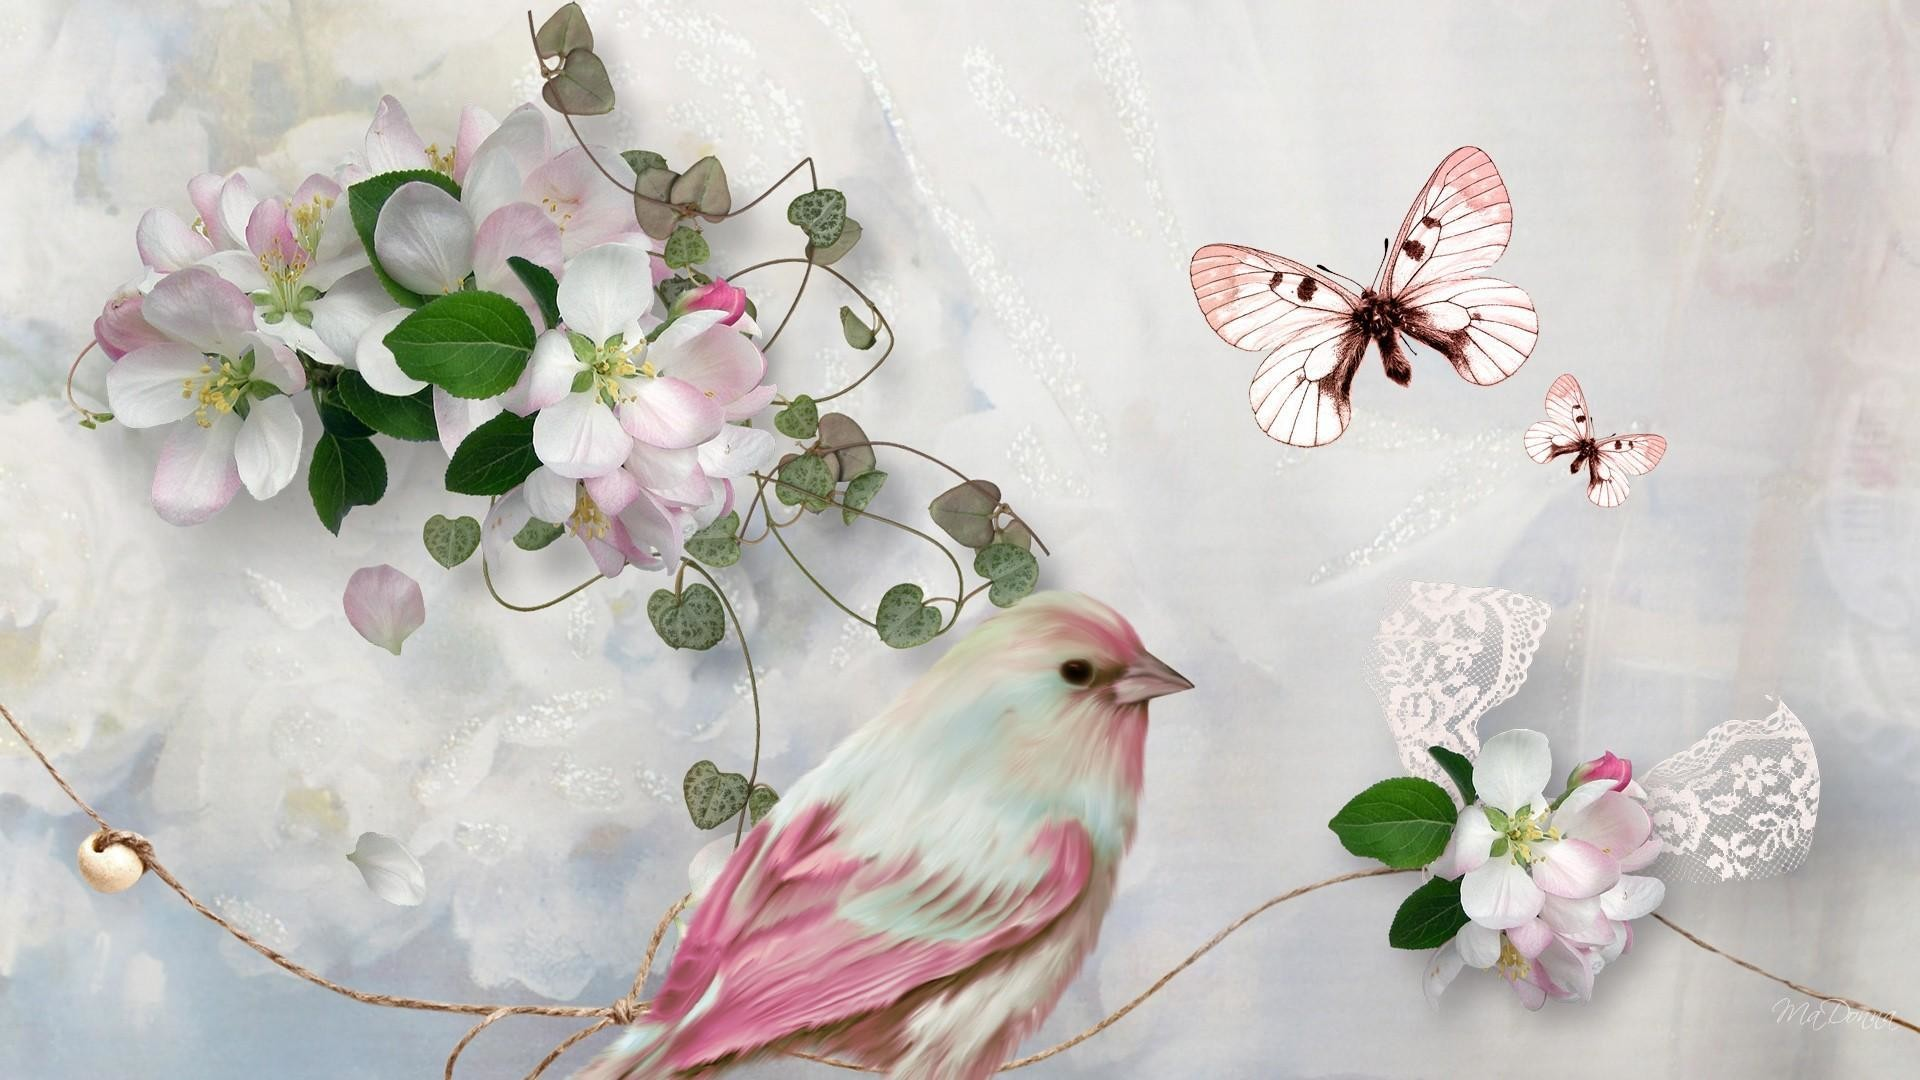 Res: 1920x1080, Spring Enchantment